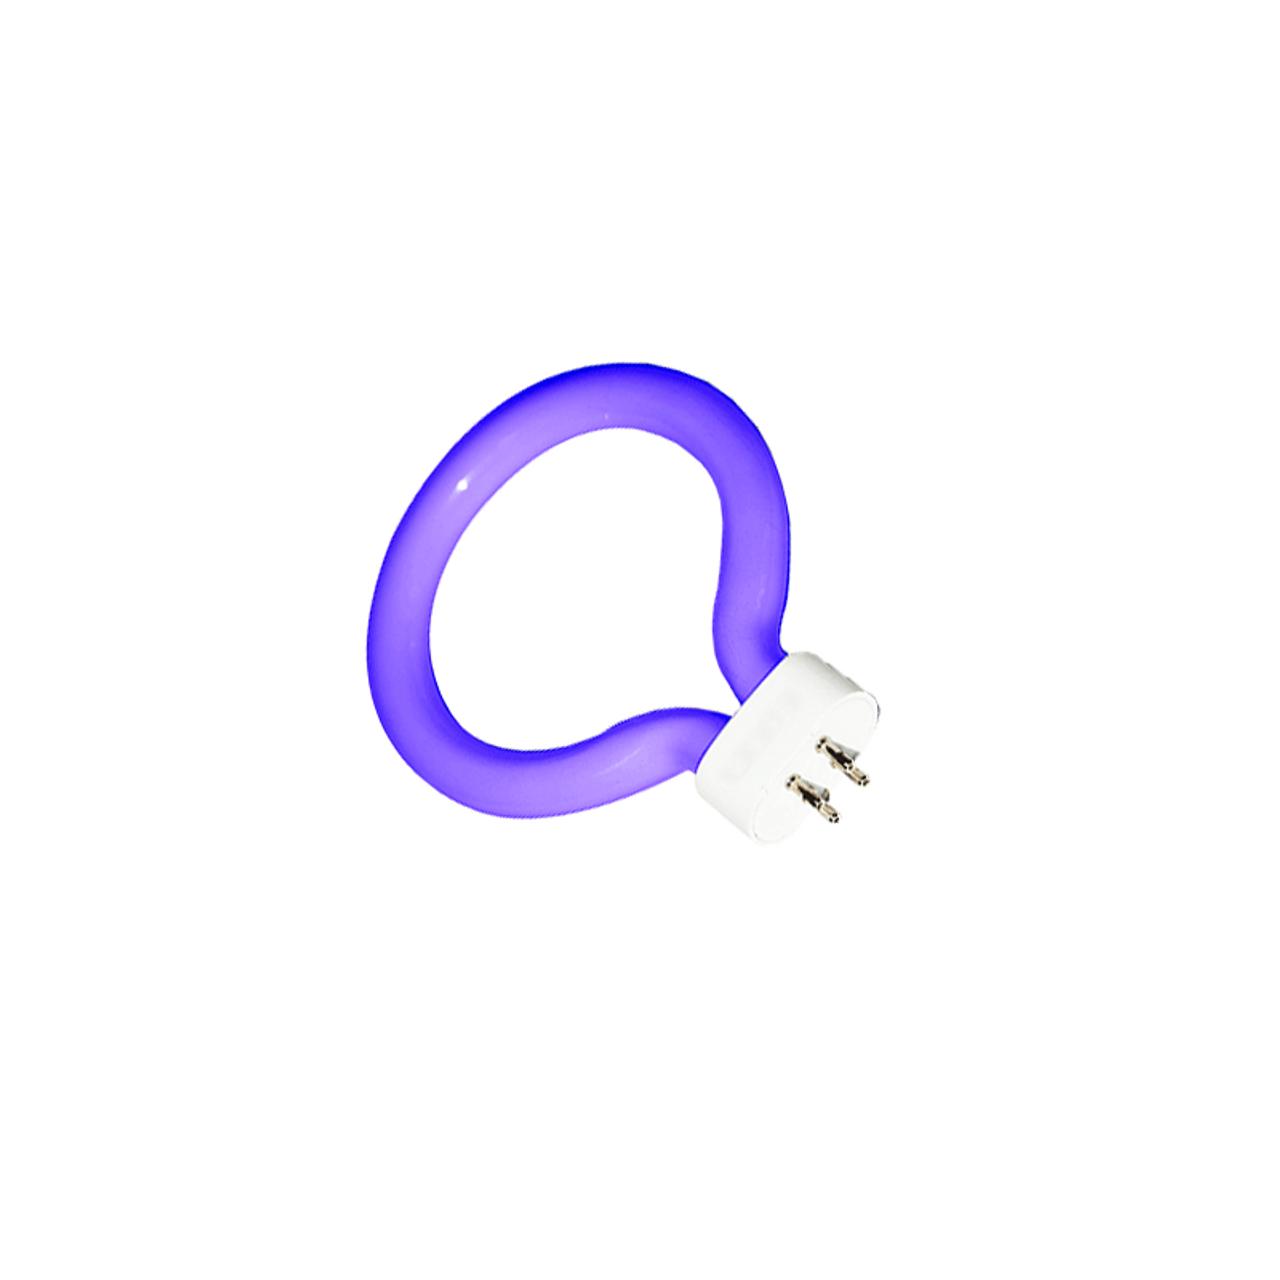 8w Ring Uv Fluorescent Ring Light Microscope Light Bulb Replacement Bu99023101